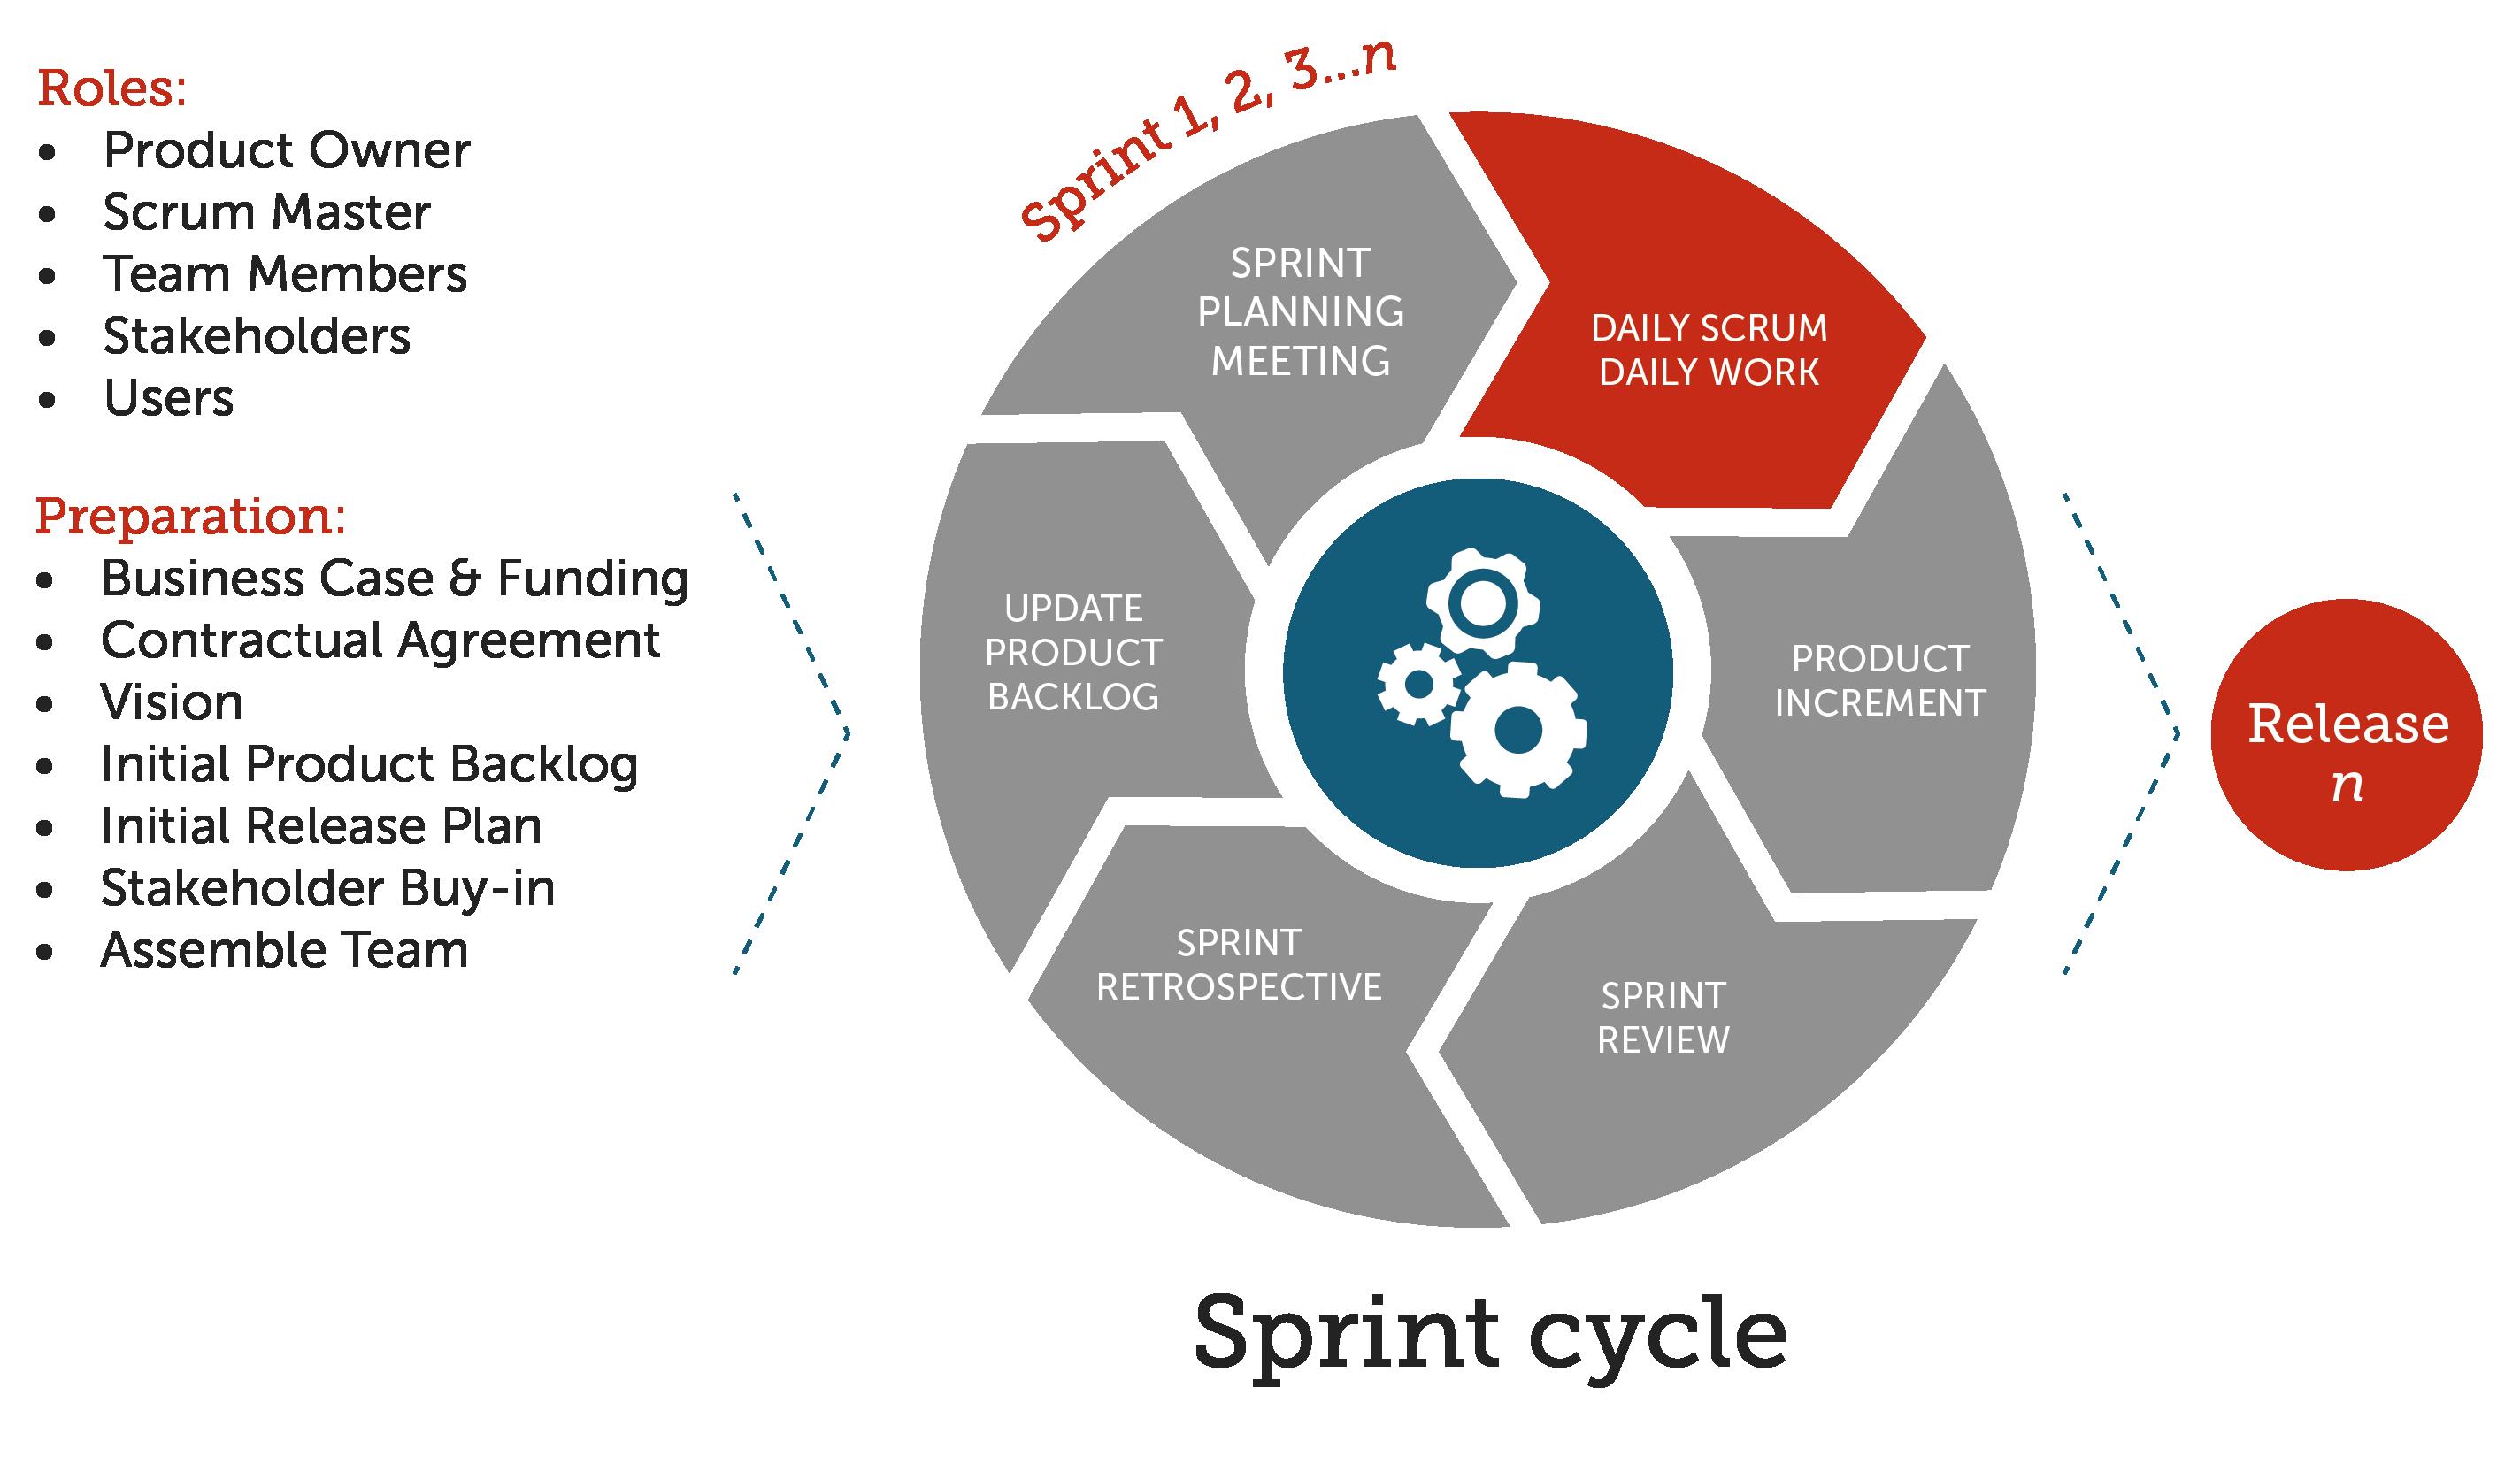 Agile Process Flow Diagram 2016 Subaru Impreza Radio Wiring The Daily Scrum As Part Of Sprint Cycle